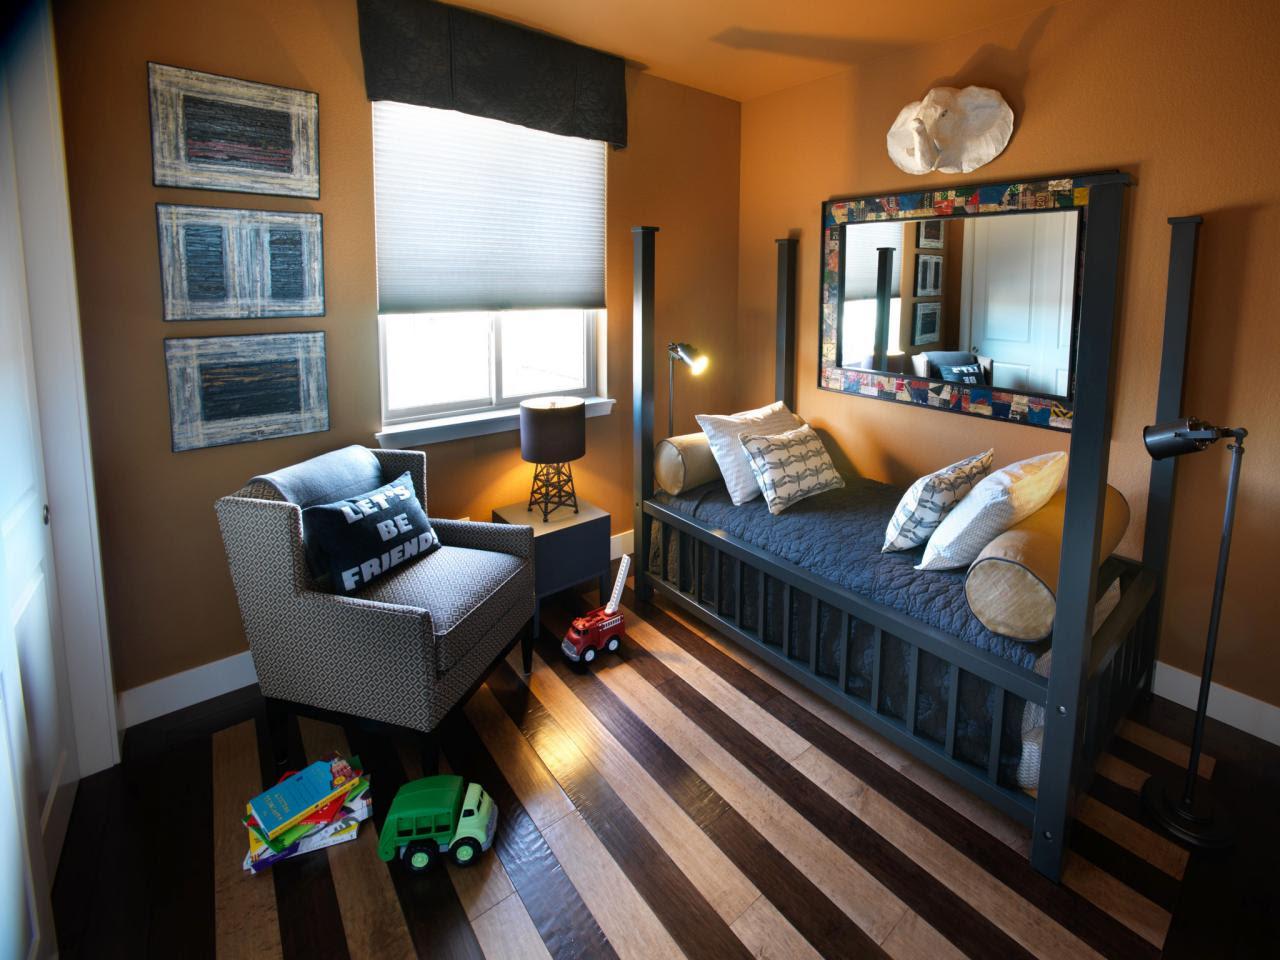 Kids' Bedroom Flooring: Pictures, Options & Ideas | HGTV